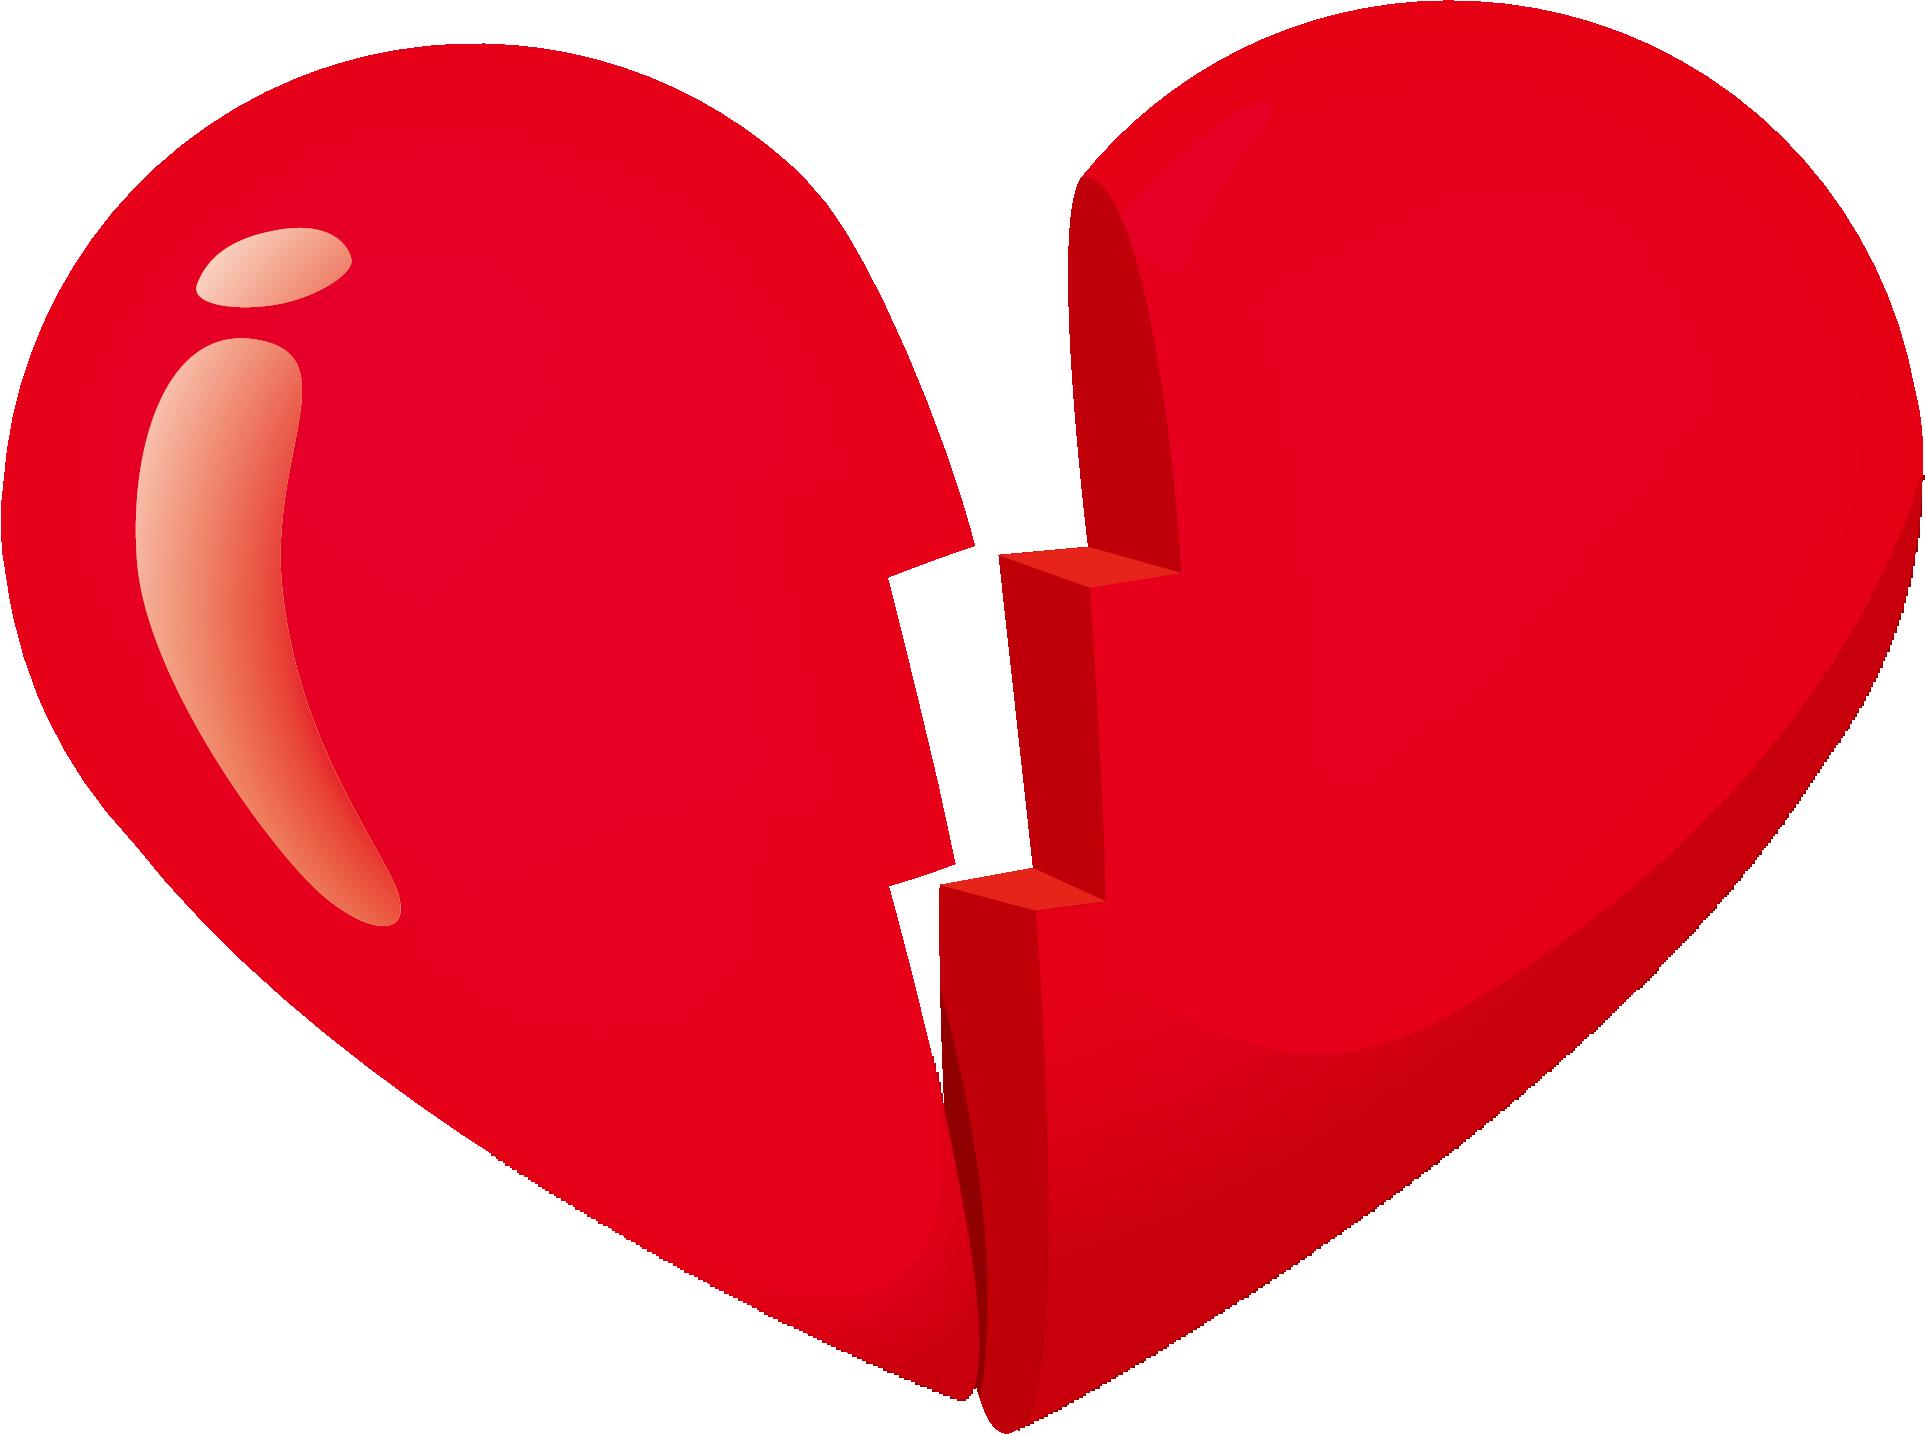 Free broken heart clipart banner library Broken heart Clip art - Broken heart 1925*1434 transprent Png Free ... banner library